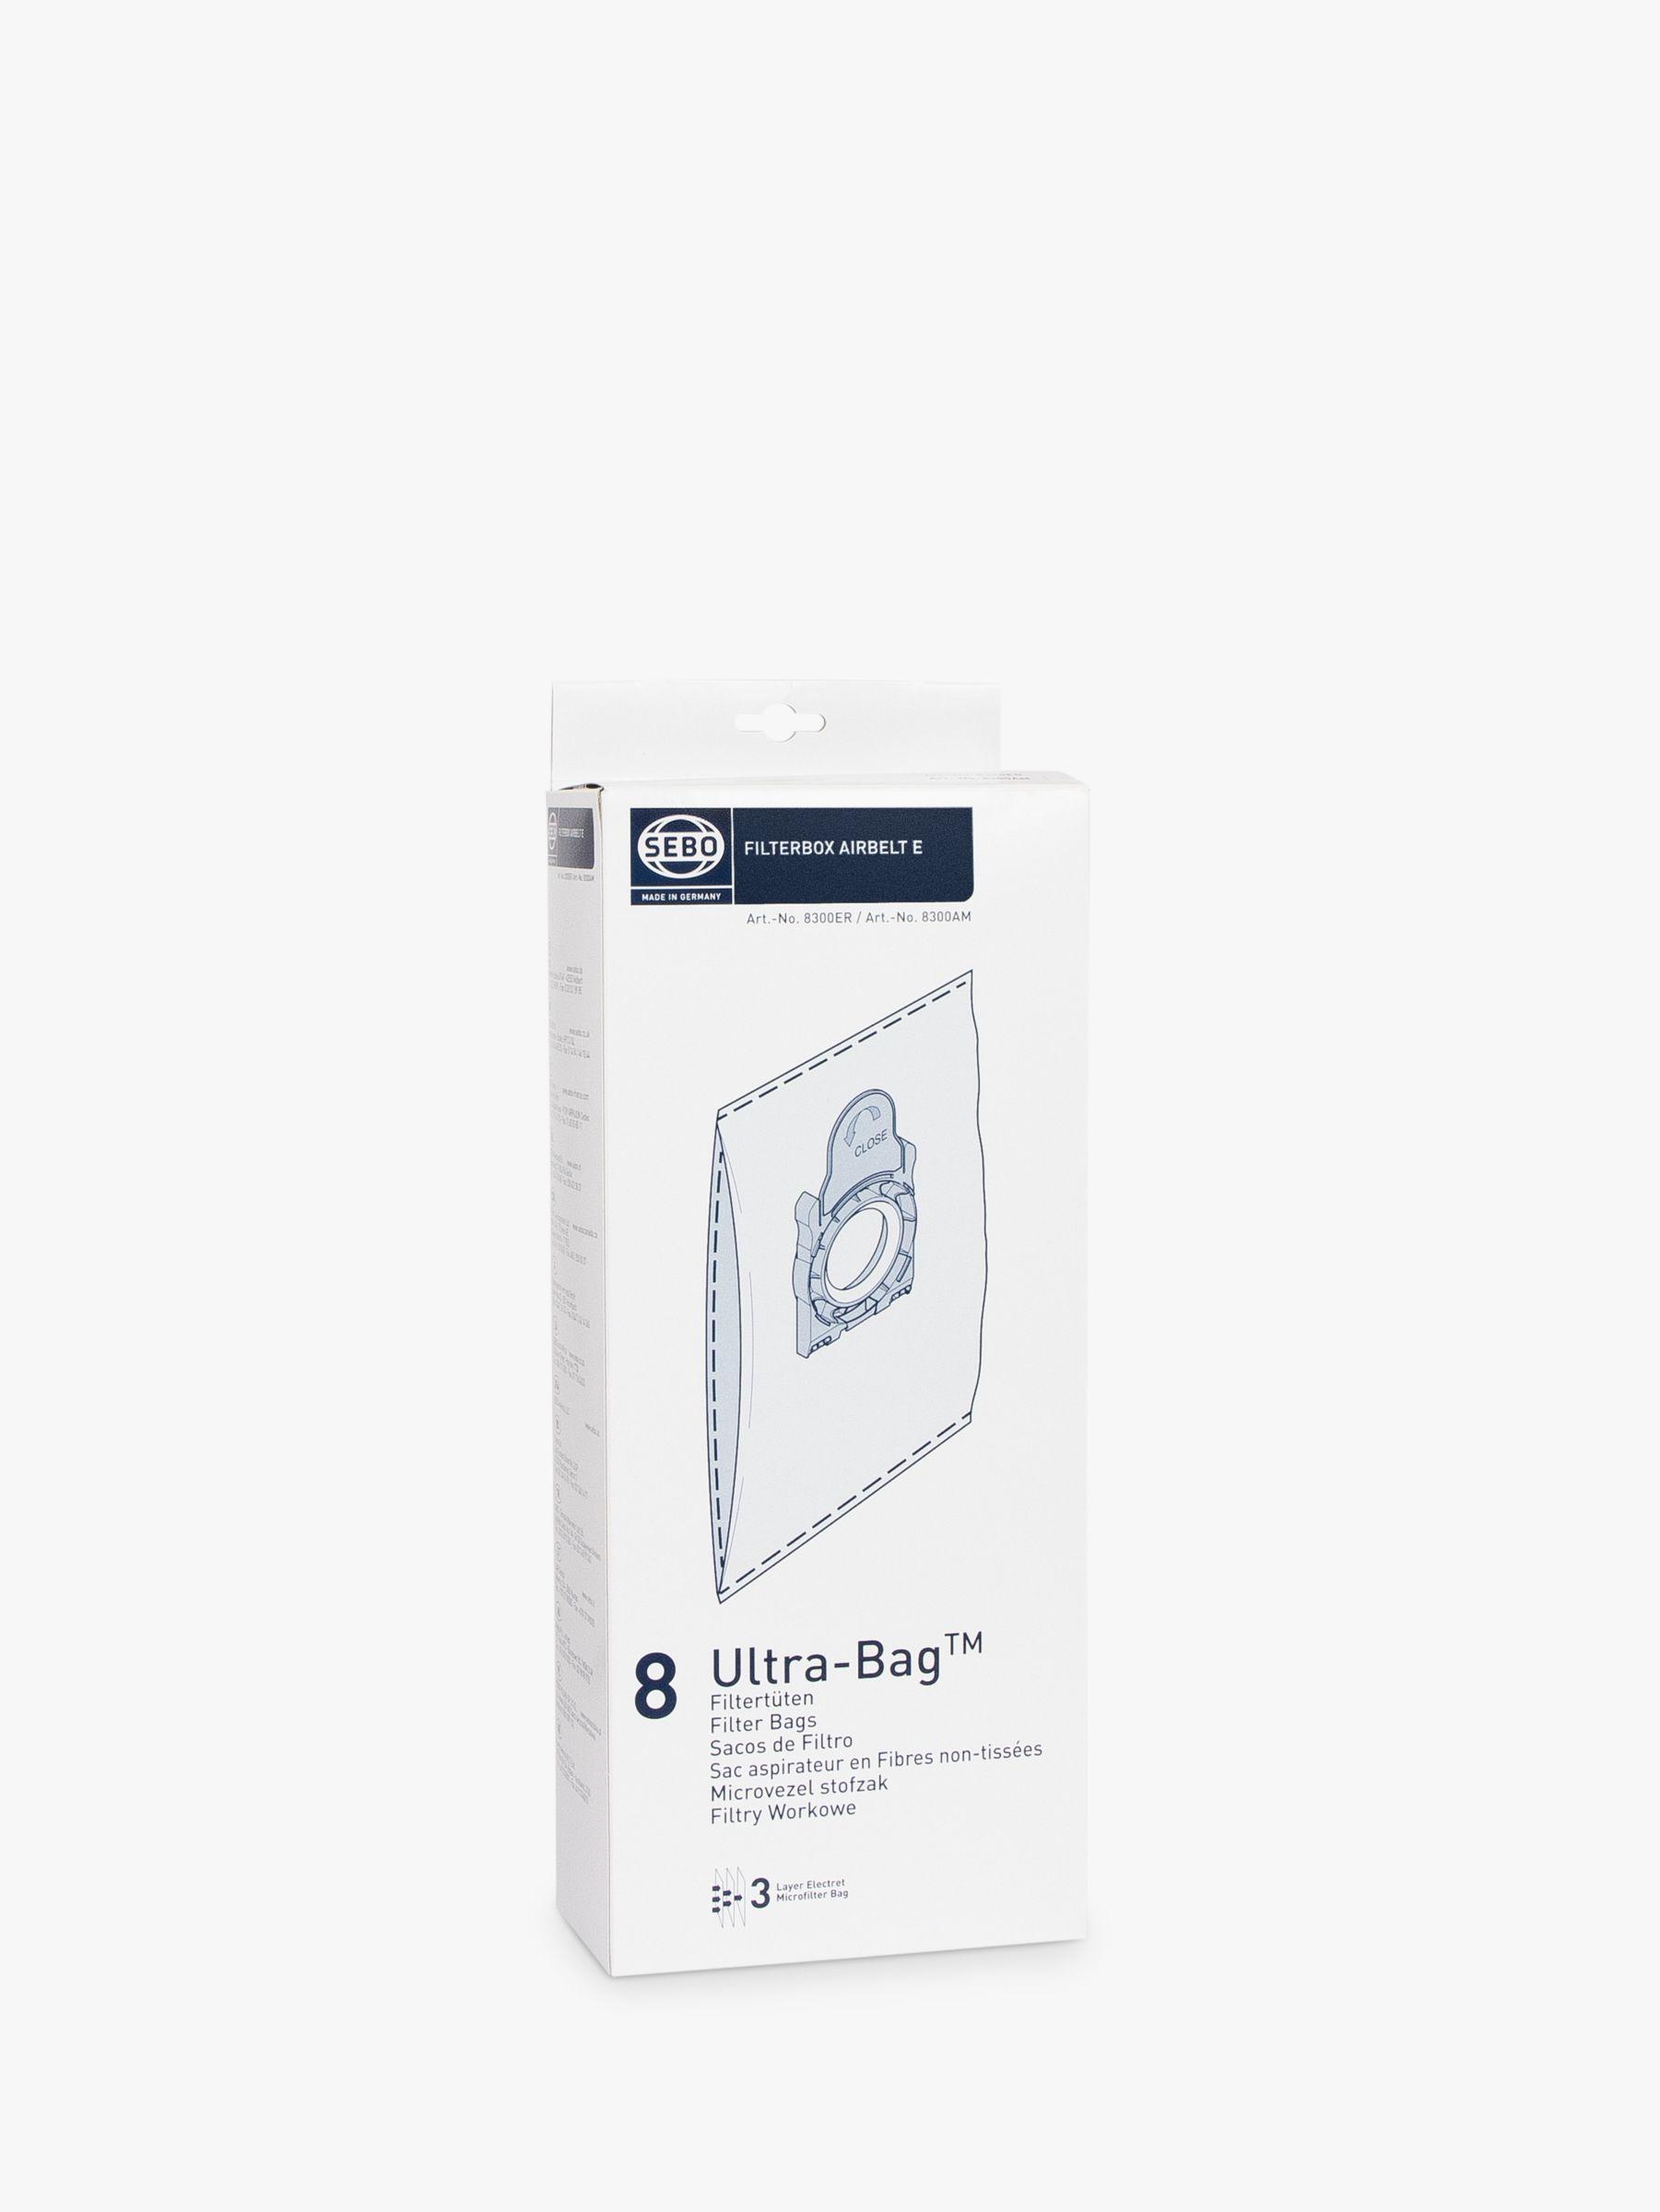 Sebo Sebo 8300ER Filterbox Airbelt E Ultra Bags